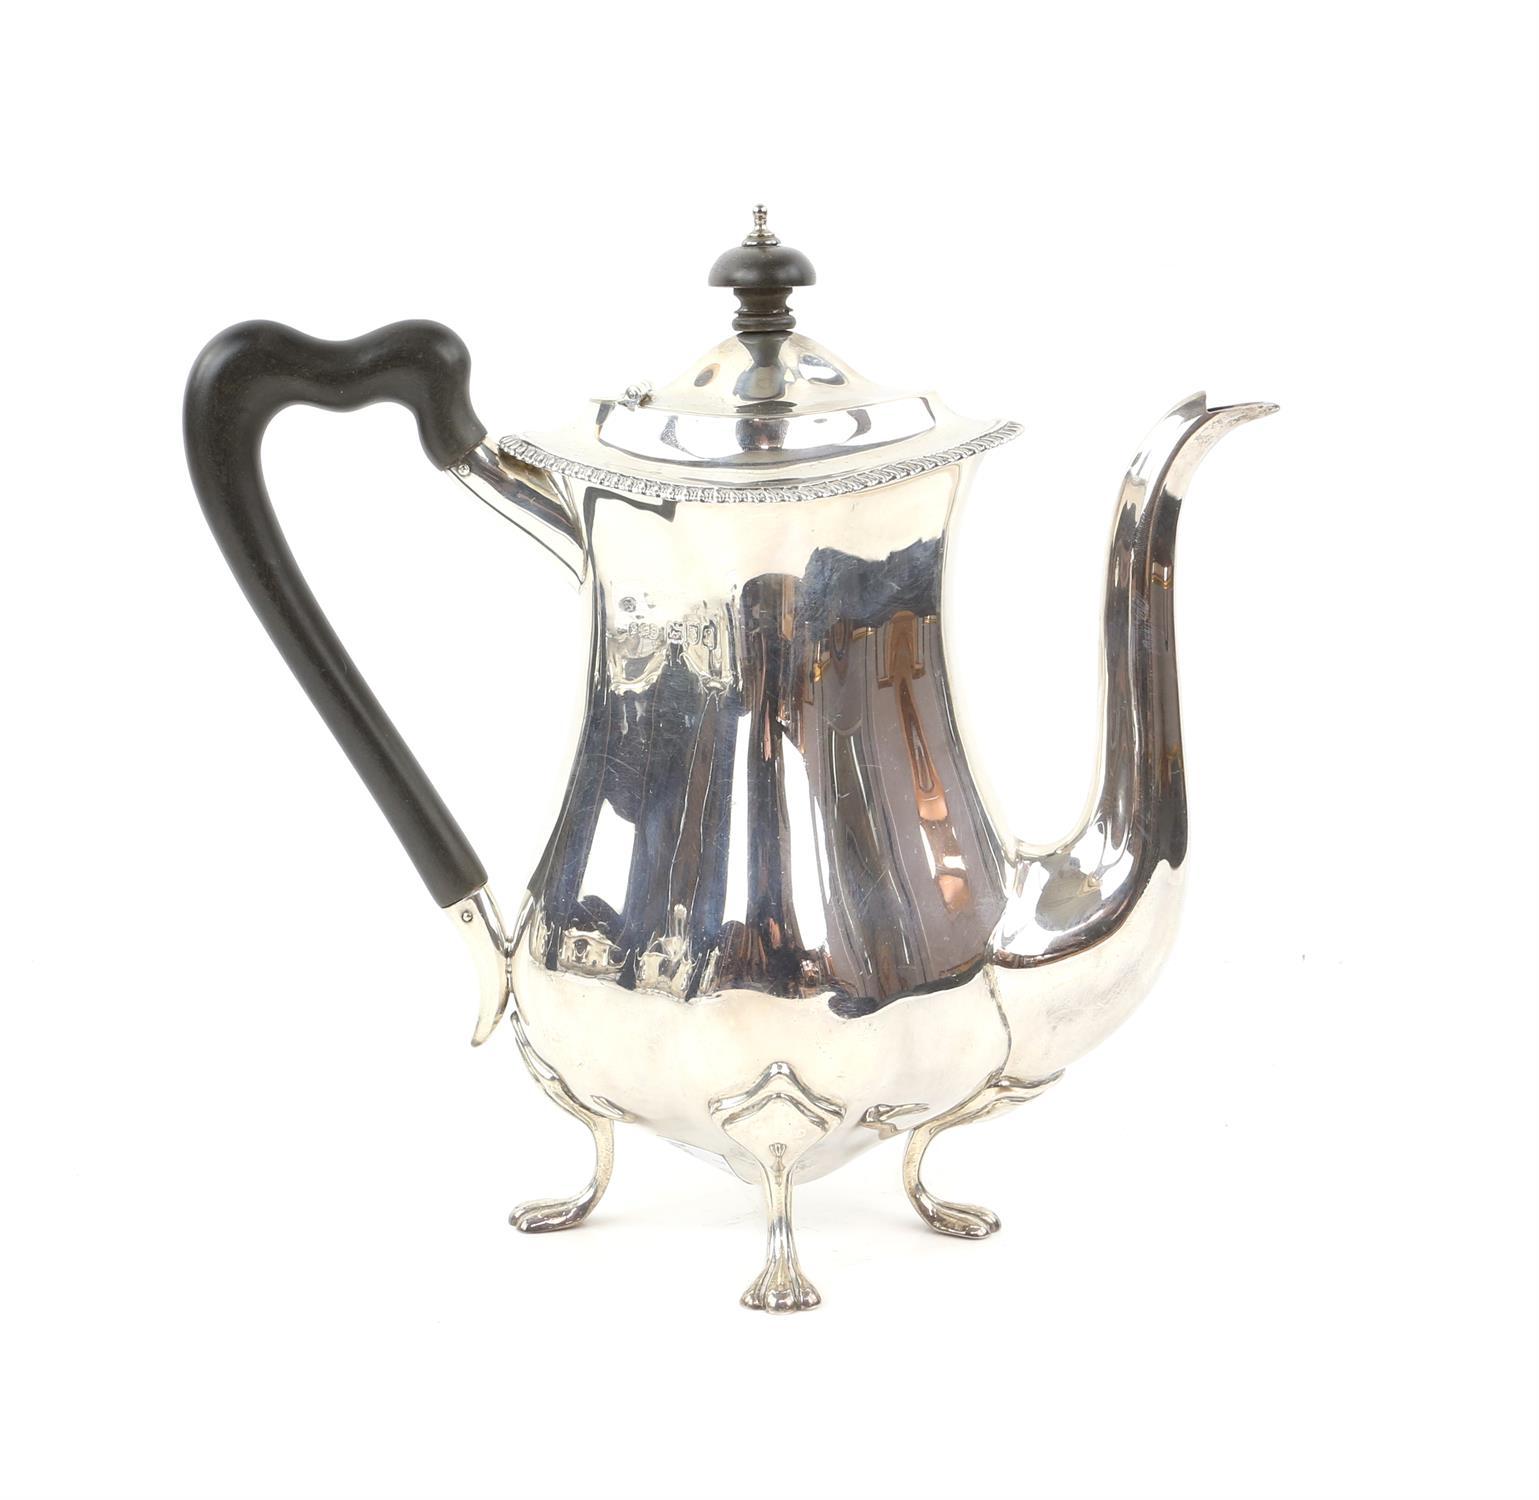 Four piece silver tea and coffee service of fluted diamond shape comprising Coffee Pot, Tea Pot, - Image 4 of 10